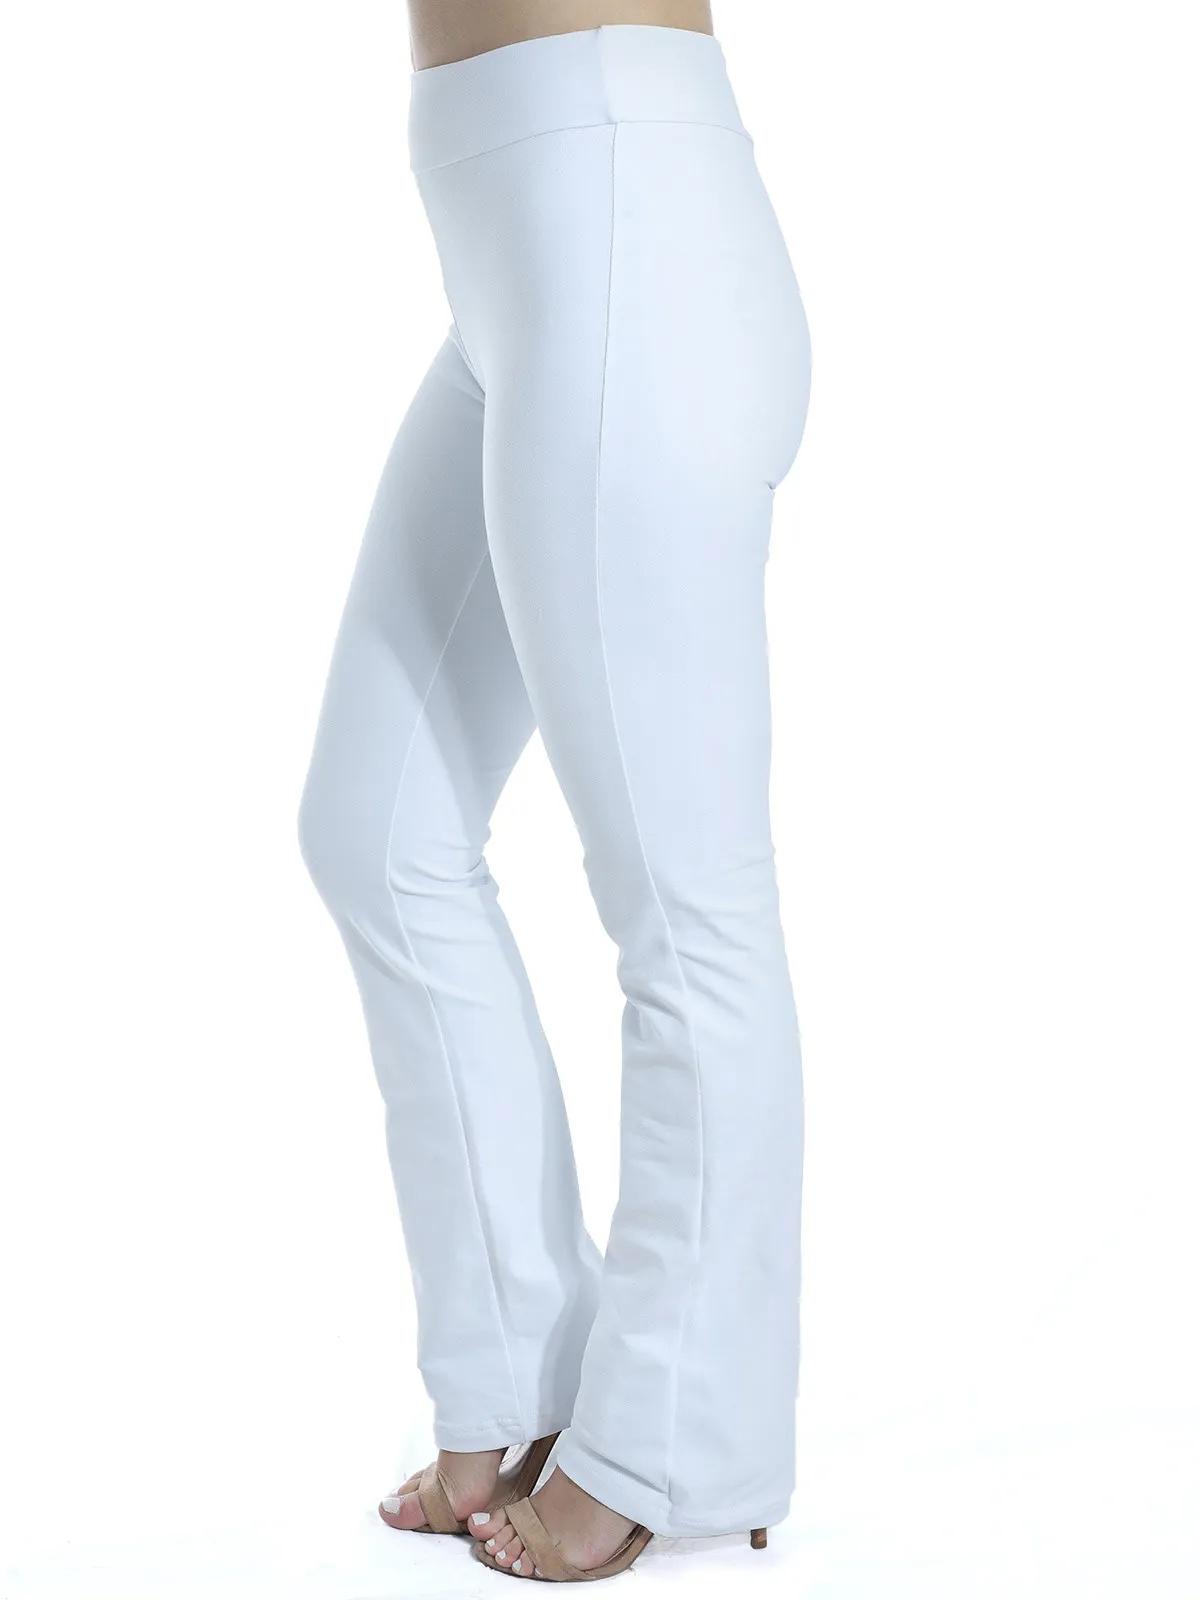 Calça Bailarina Legging Feminina Fitness Confort Branca